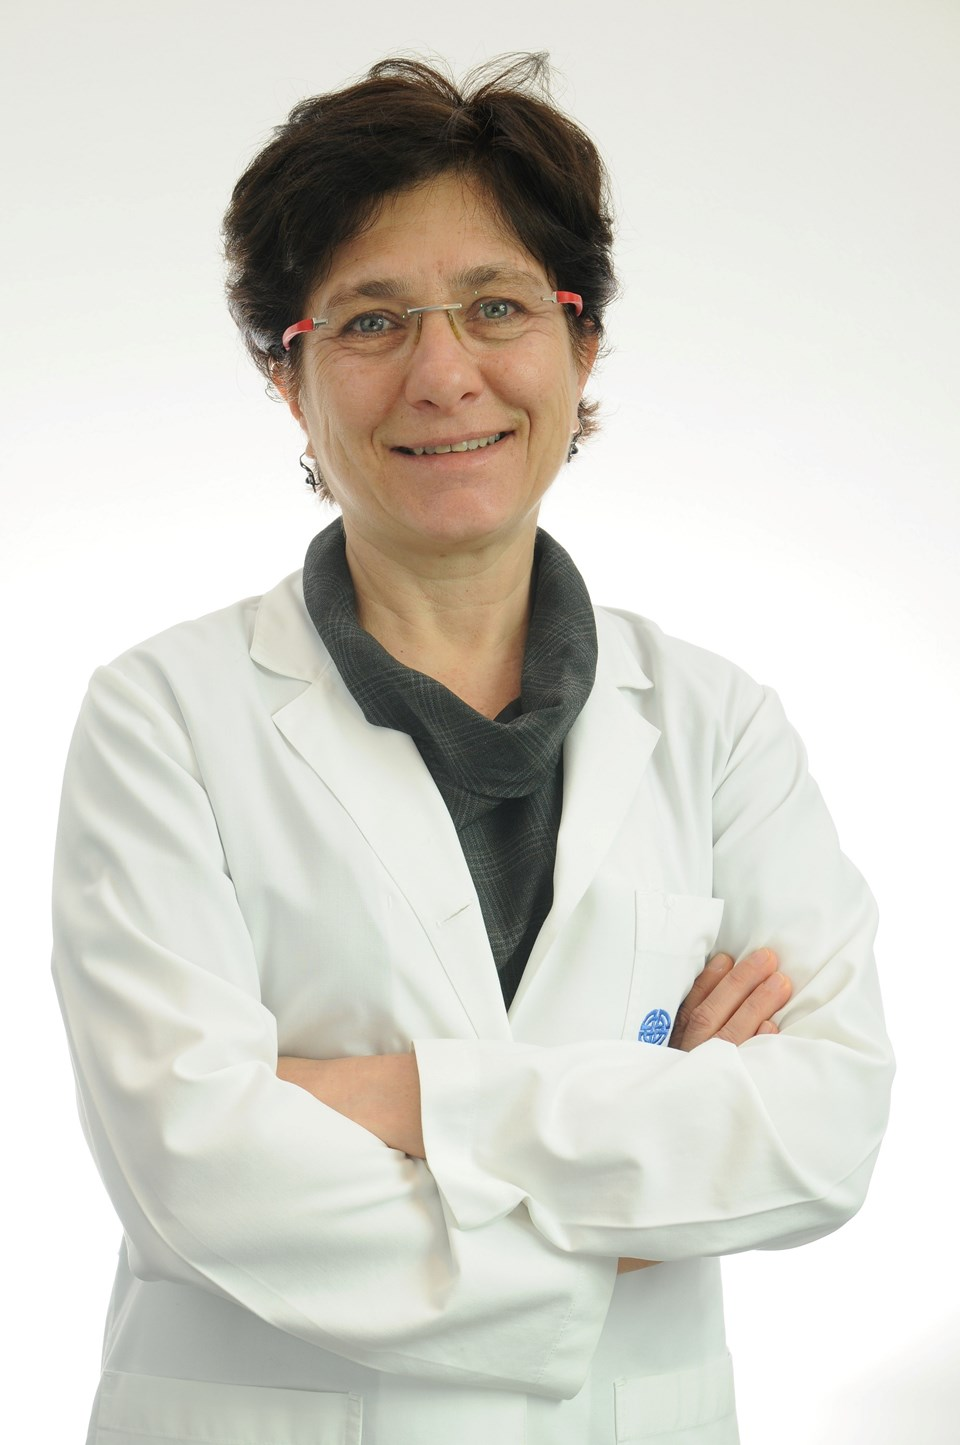 Doç. Dr. Betül Yalçıner